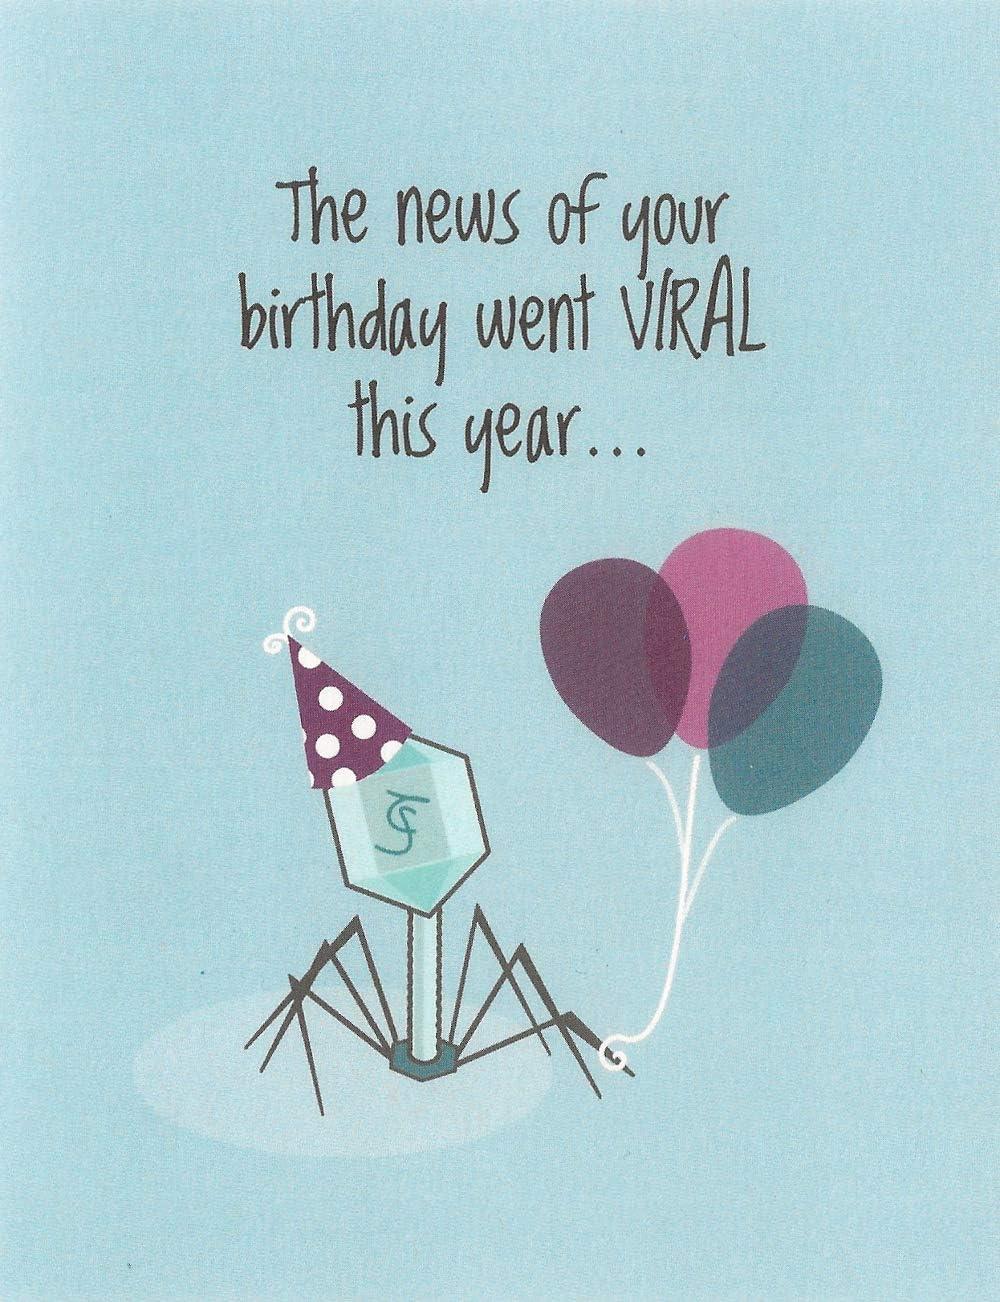 Viral Birthday Virus Card 4.25 X 5.5 by Nerdy Words